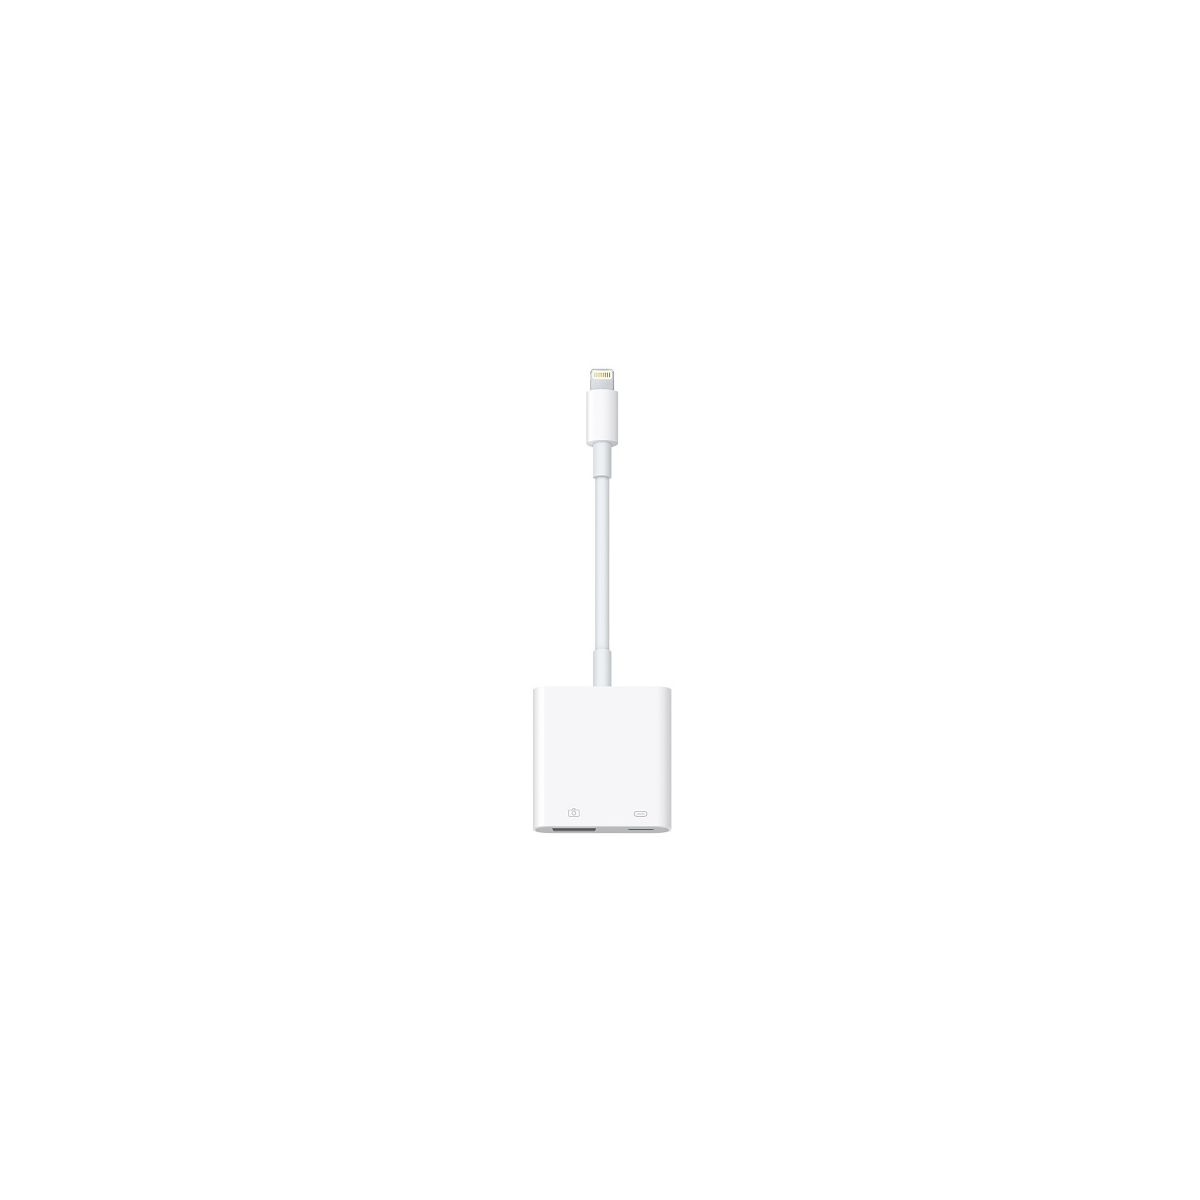 Adaptateur lightning APPLE Lightning vers USB3 pr appareil photo (photo)